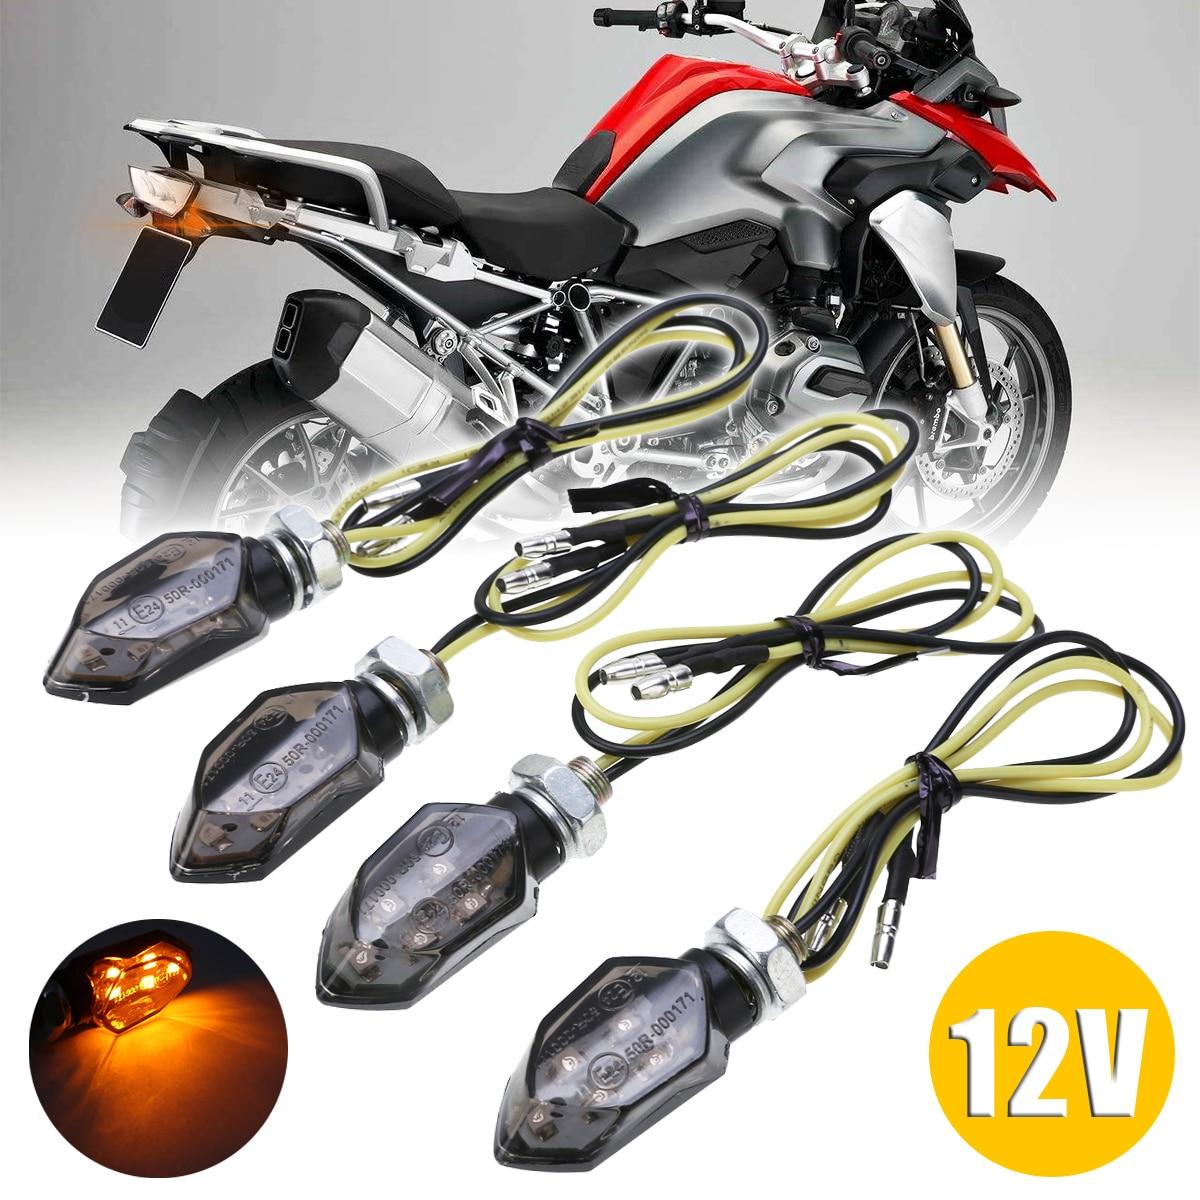 4PCS SUPER BRIGHT CUSTOM MOTORCYCLE SMOKE LED TURN SIGNAL INDICATORS LIGHT AMBER